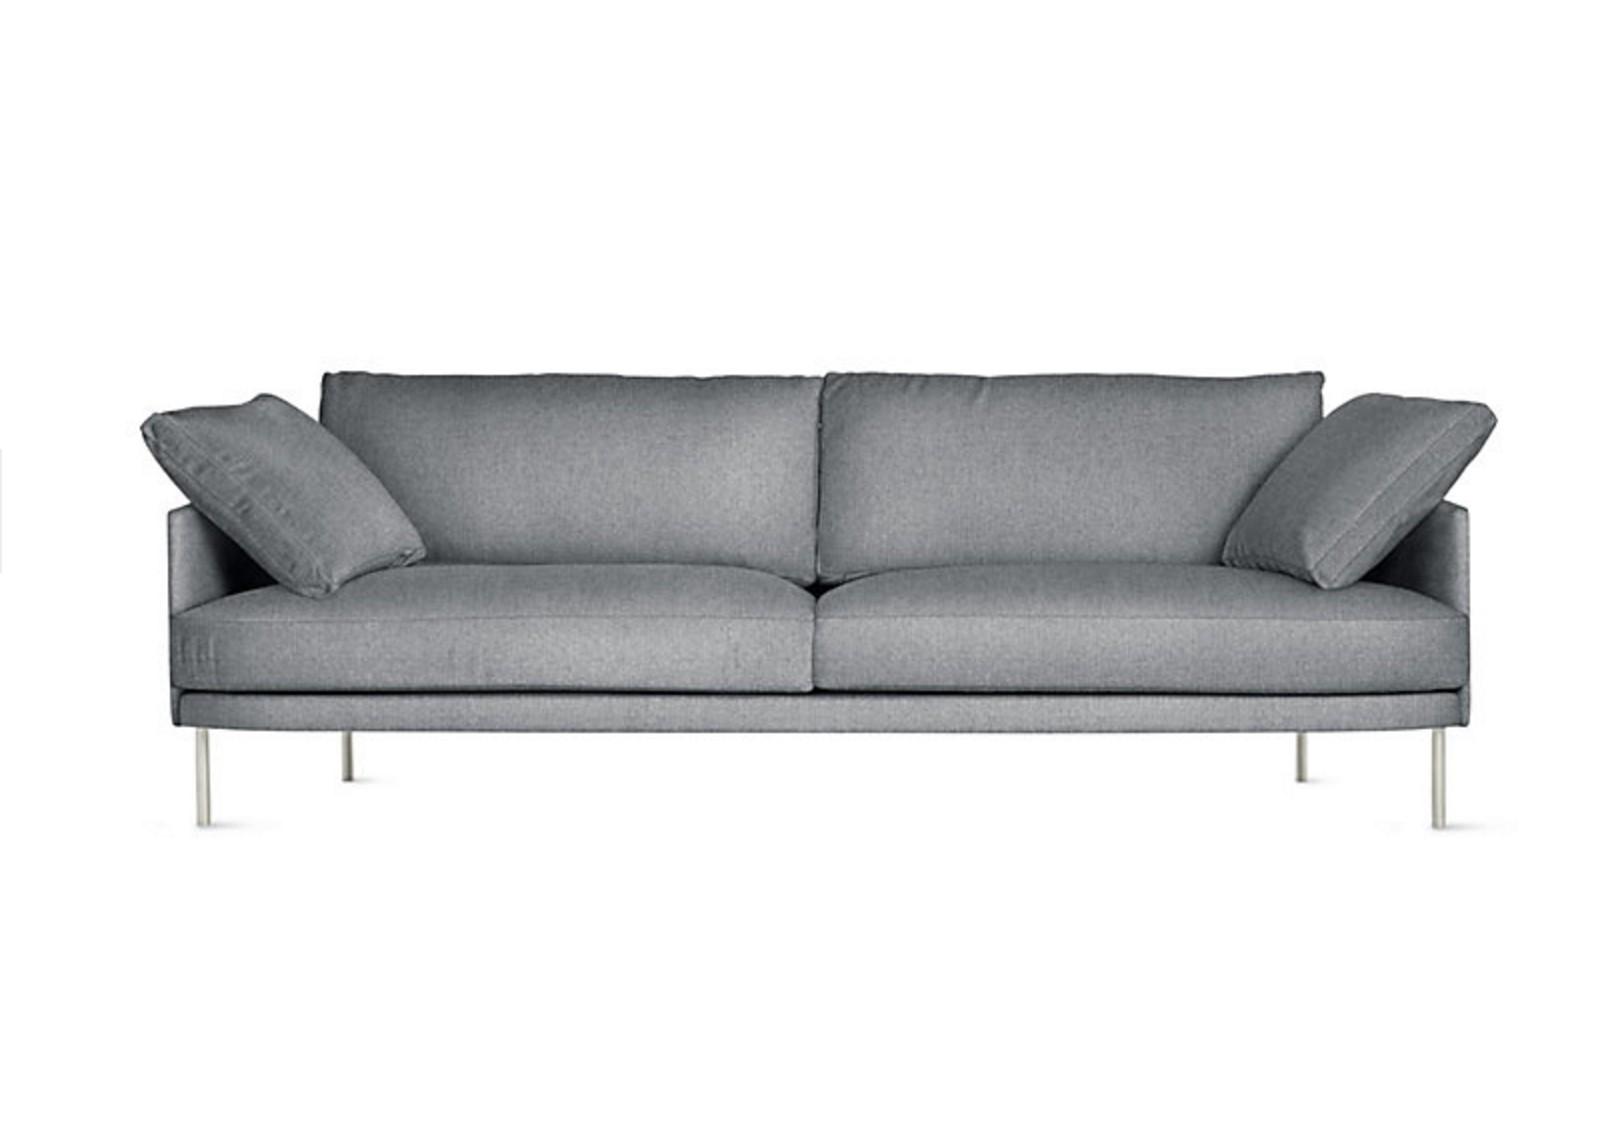 Ml диван campbel серый  38025/38050